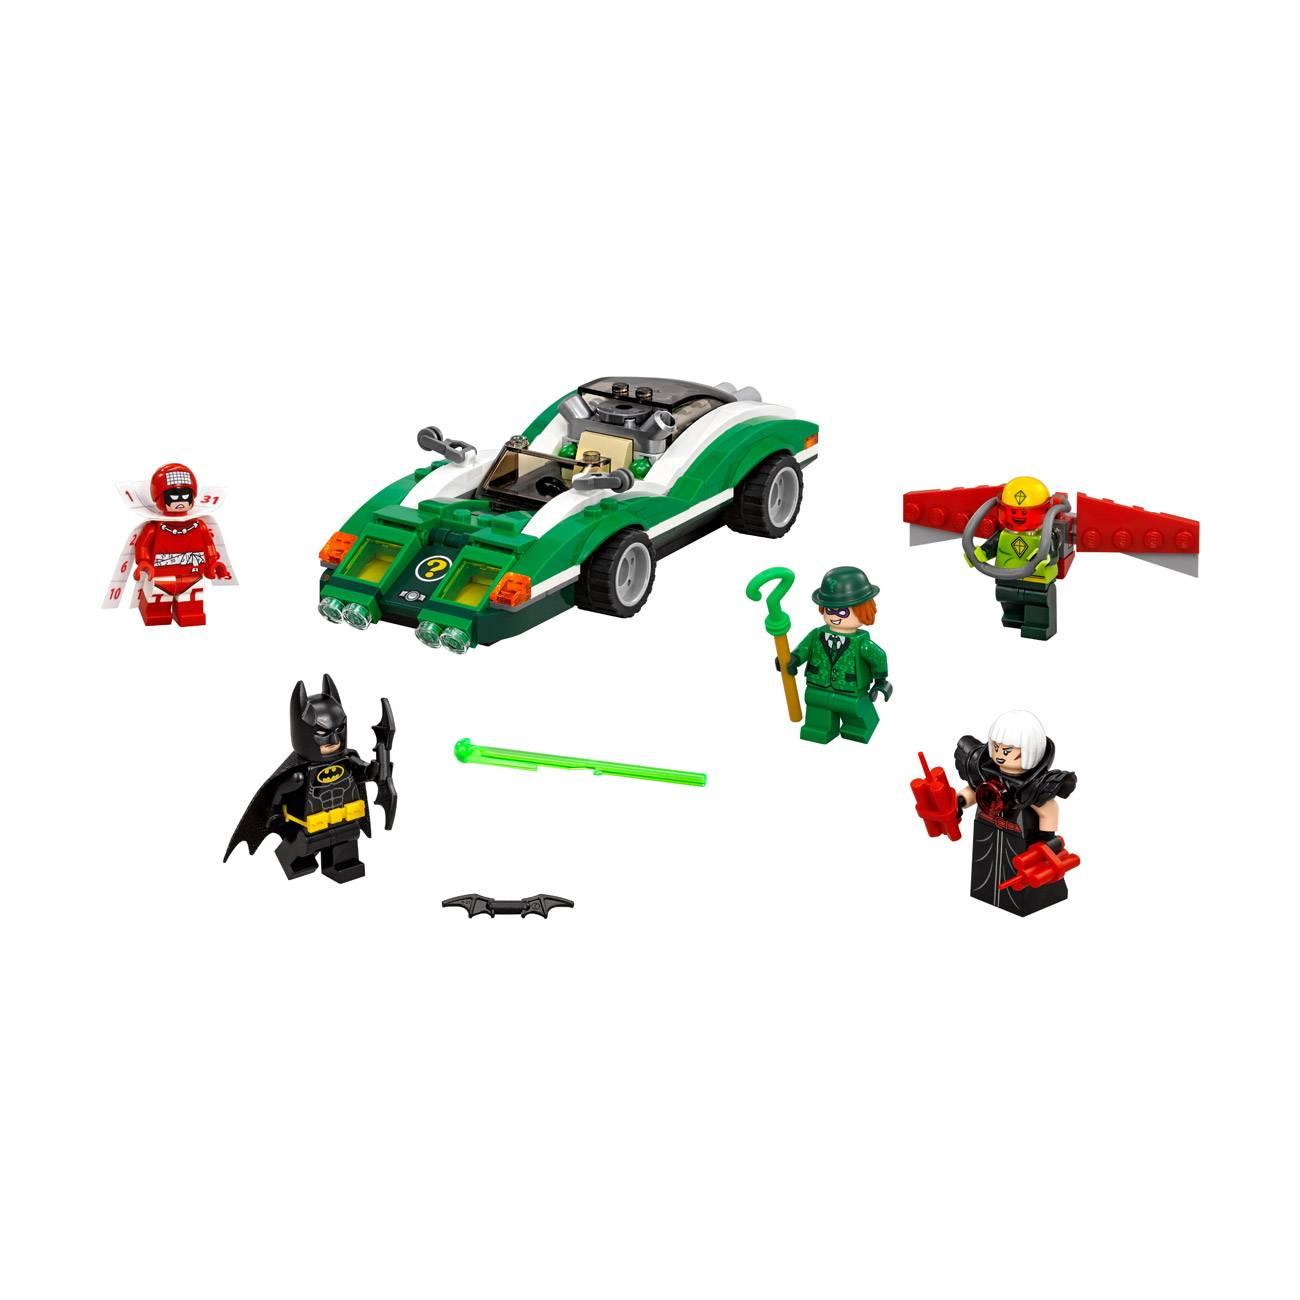 BATMAN MOVIE THE RIDDLER RIDDLE RACER